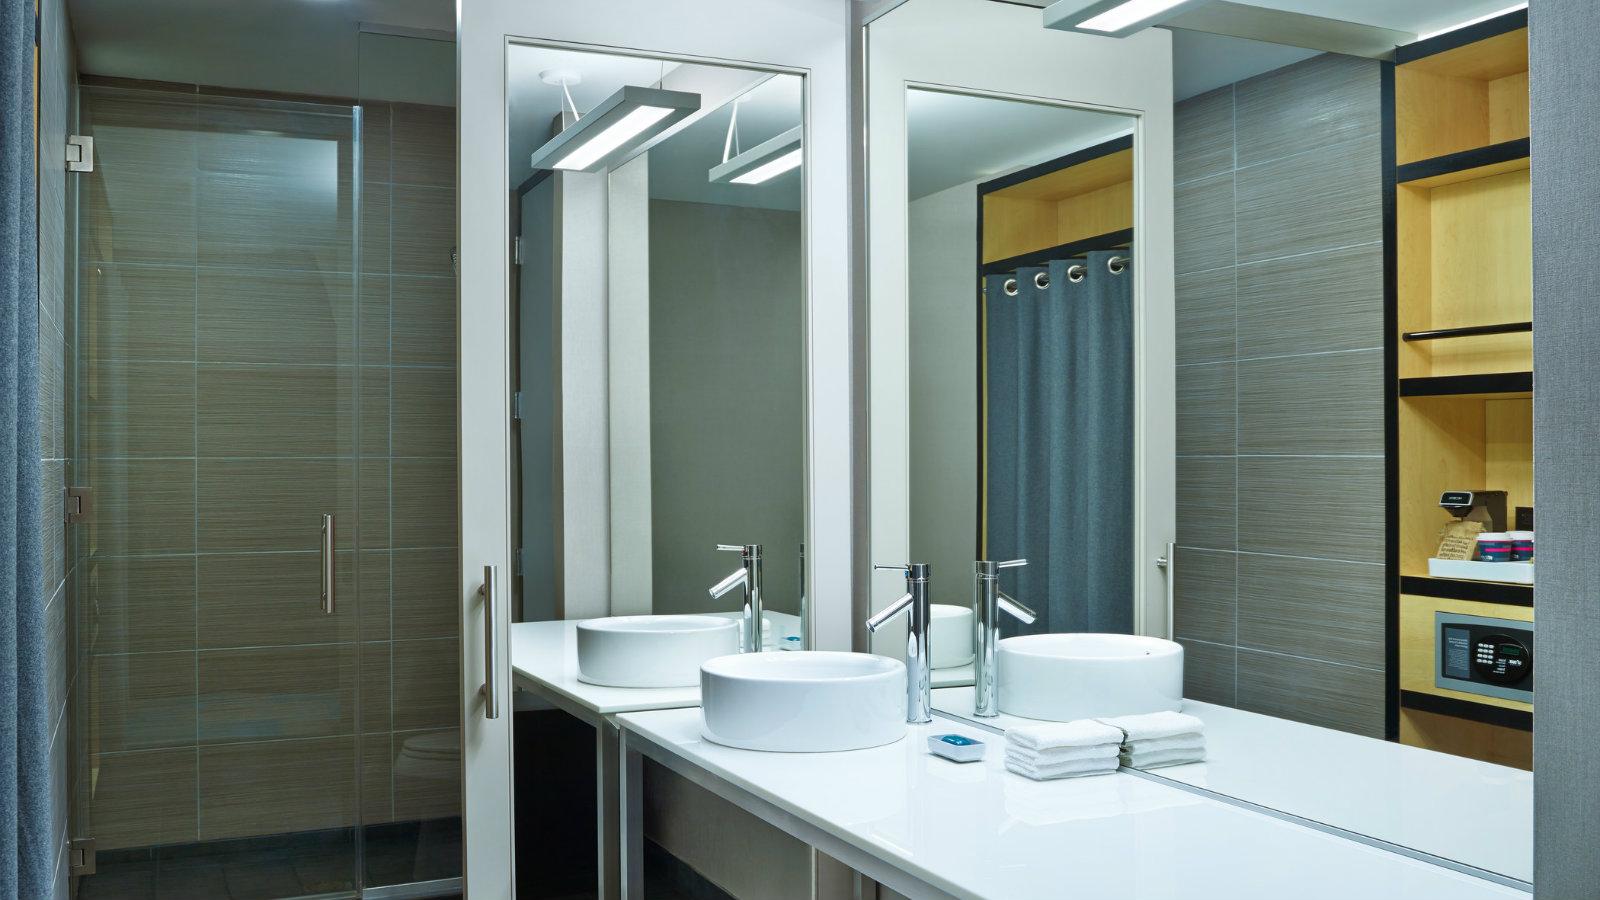 Bathroom Sinks Okc aloft oklahoma city downtown - brides of oklahoma